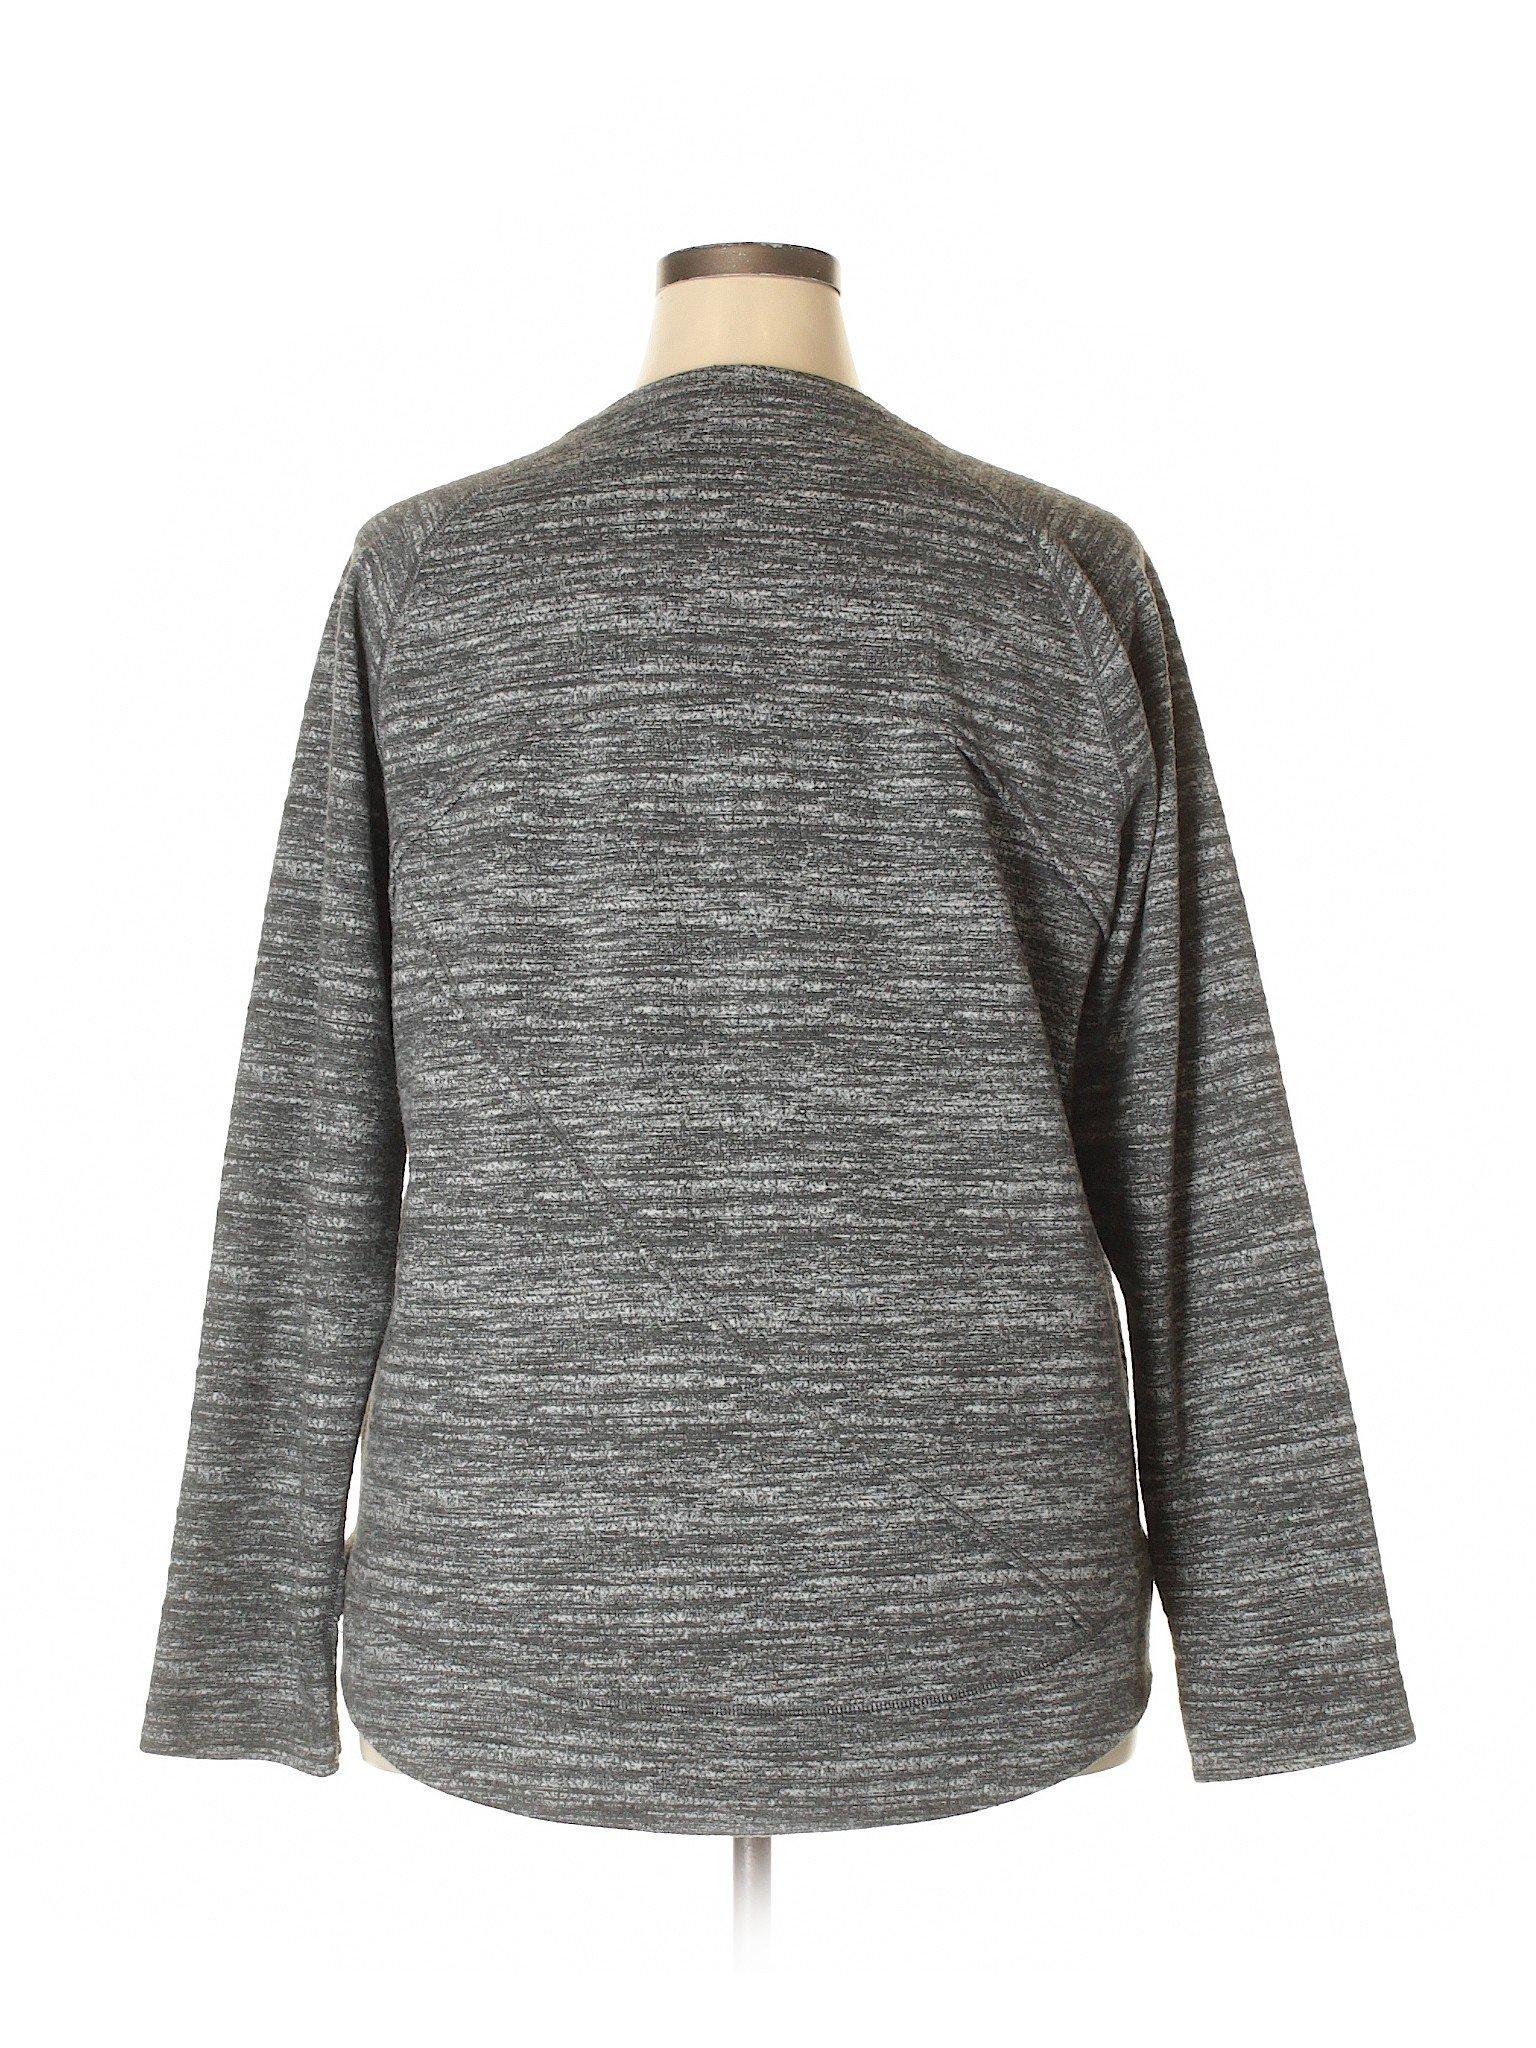 Sweater Boutique Boutique KIRKLAND KIRKLAND Pullover Signature xqaB0YRw